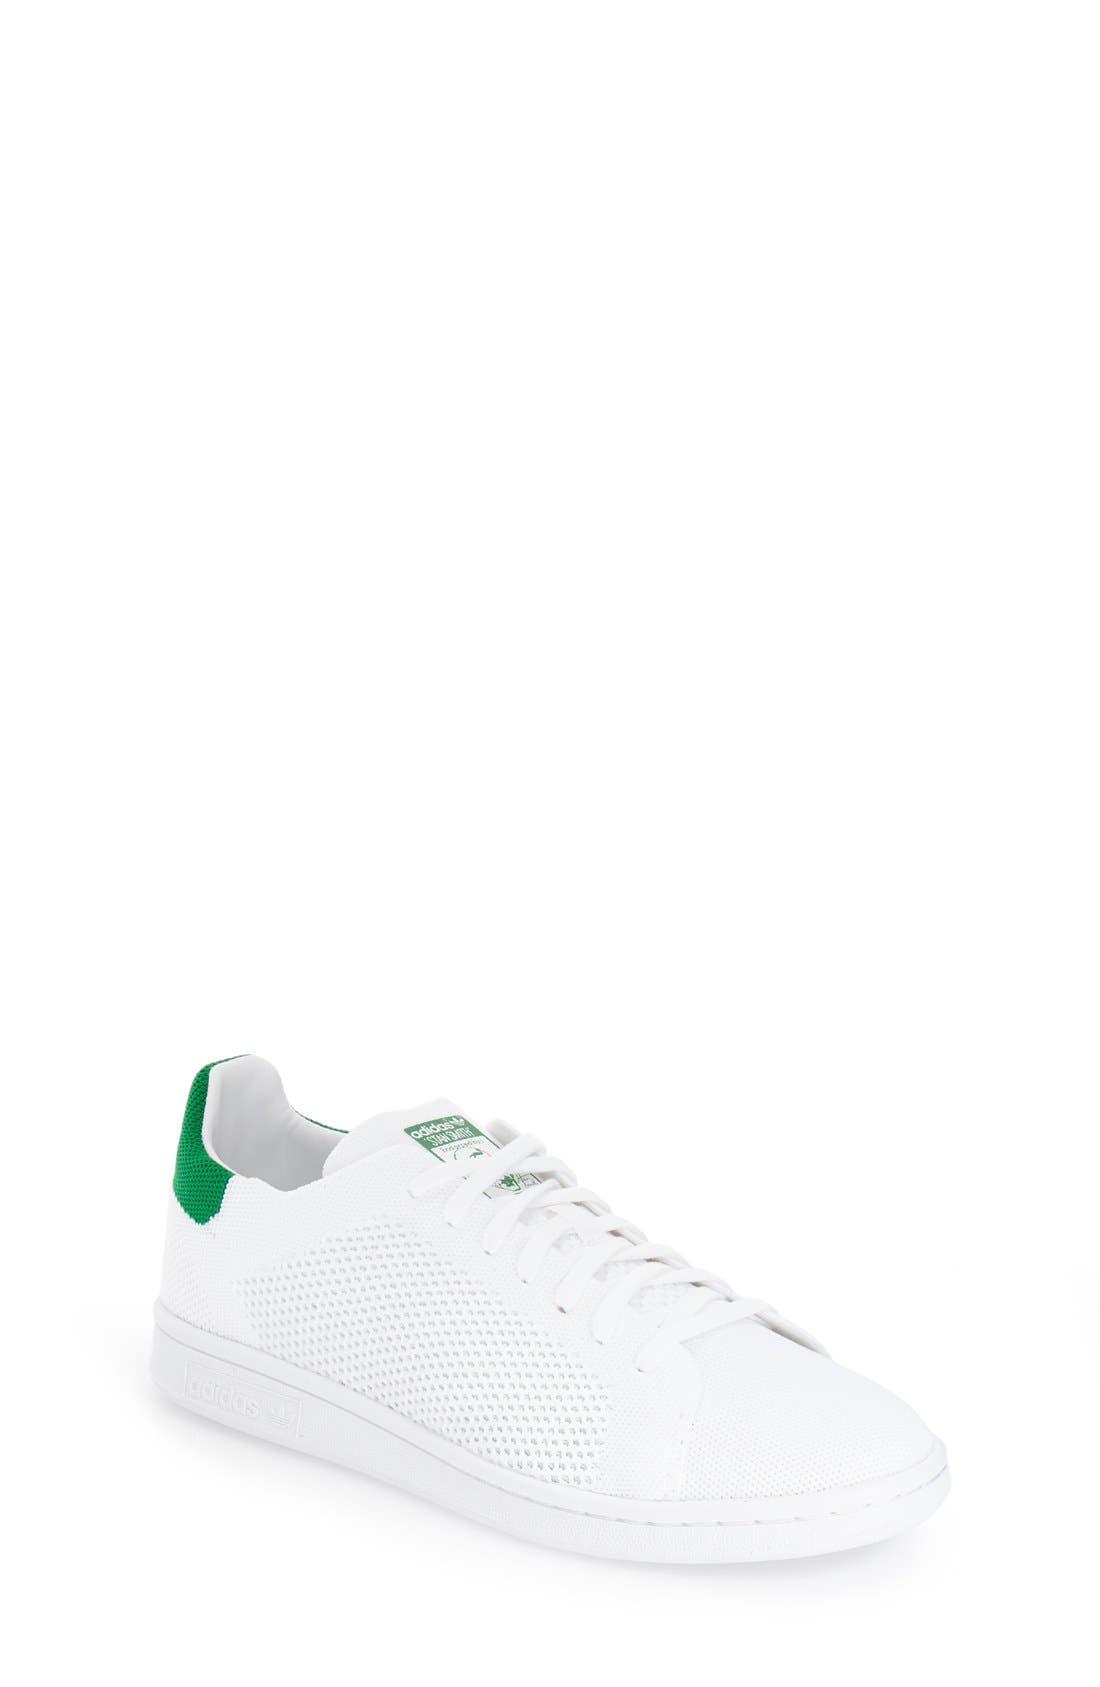 Main Image - adidas \u0027Stan Smith - Primeknit\u0027 Sneaker ...